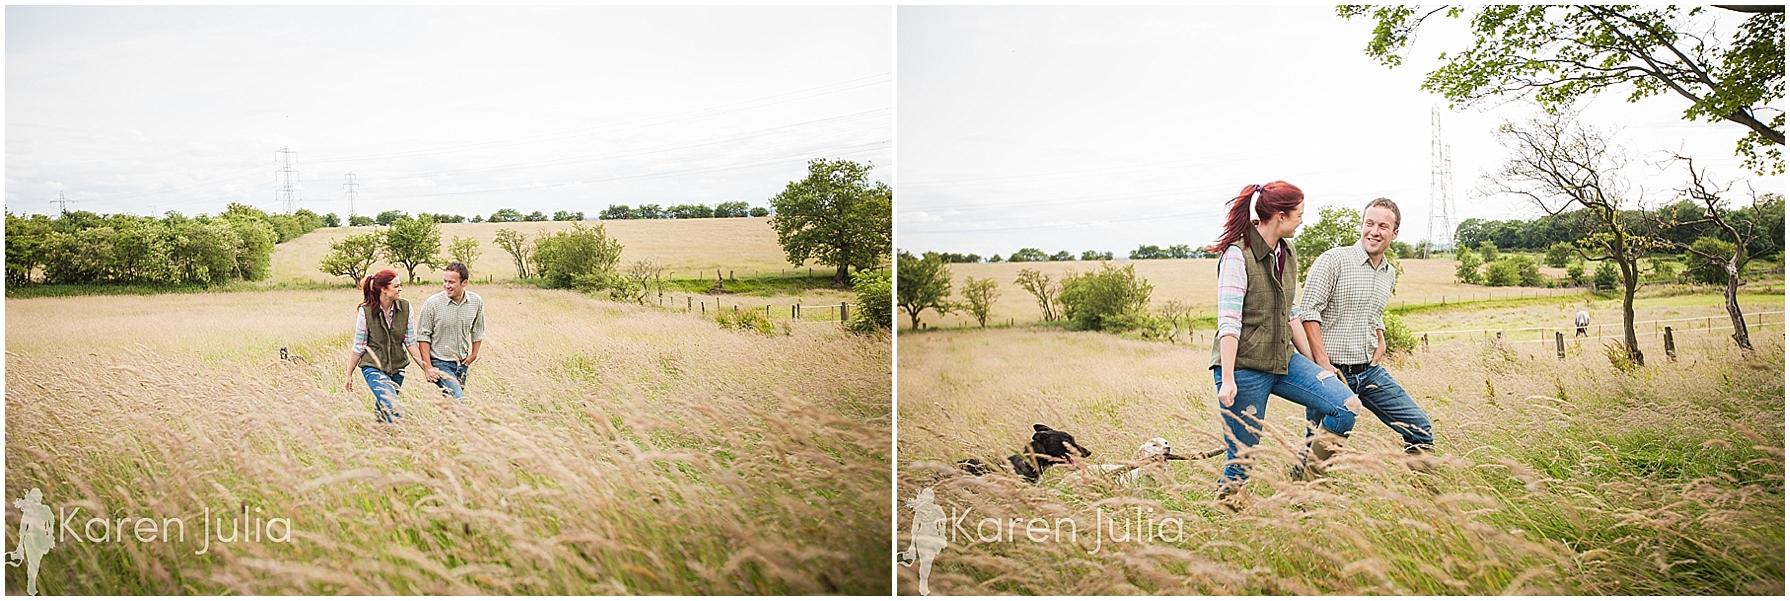 Rural-Engagement-shoot-04